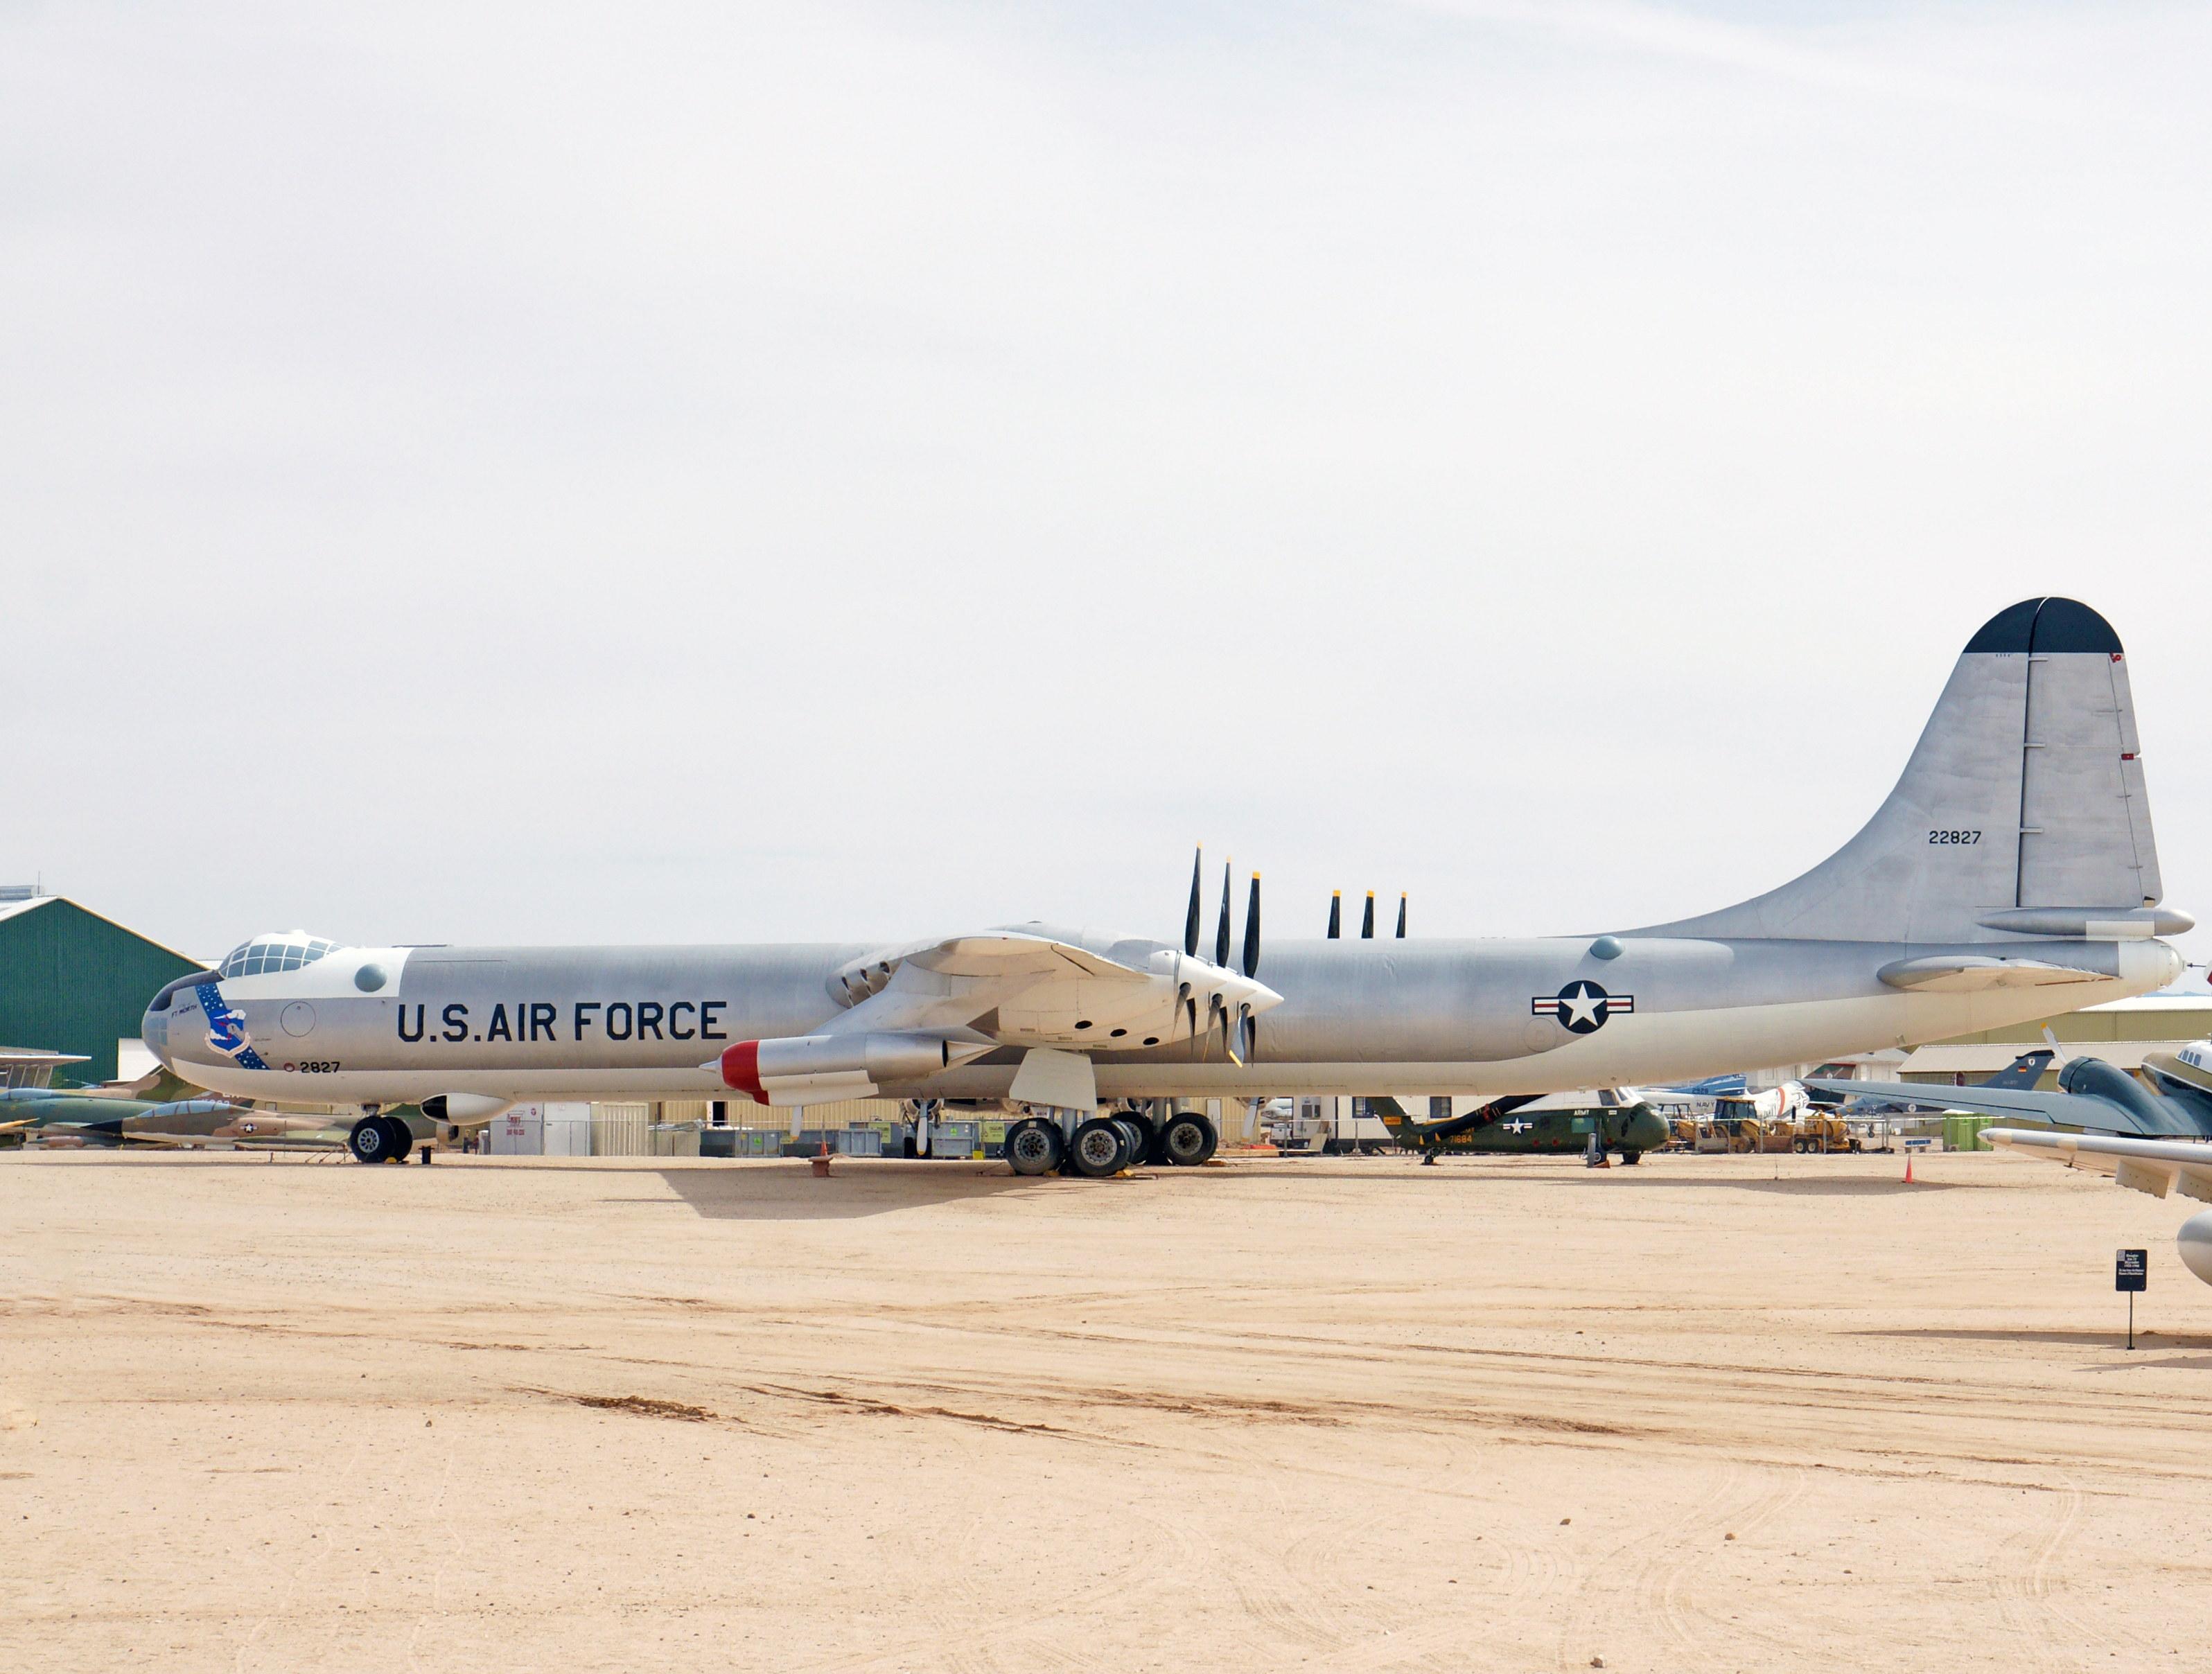 Convair B-36J Peacemaker side view